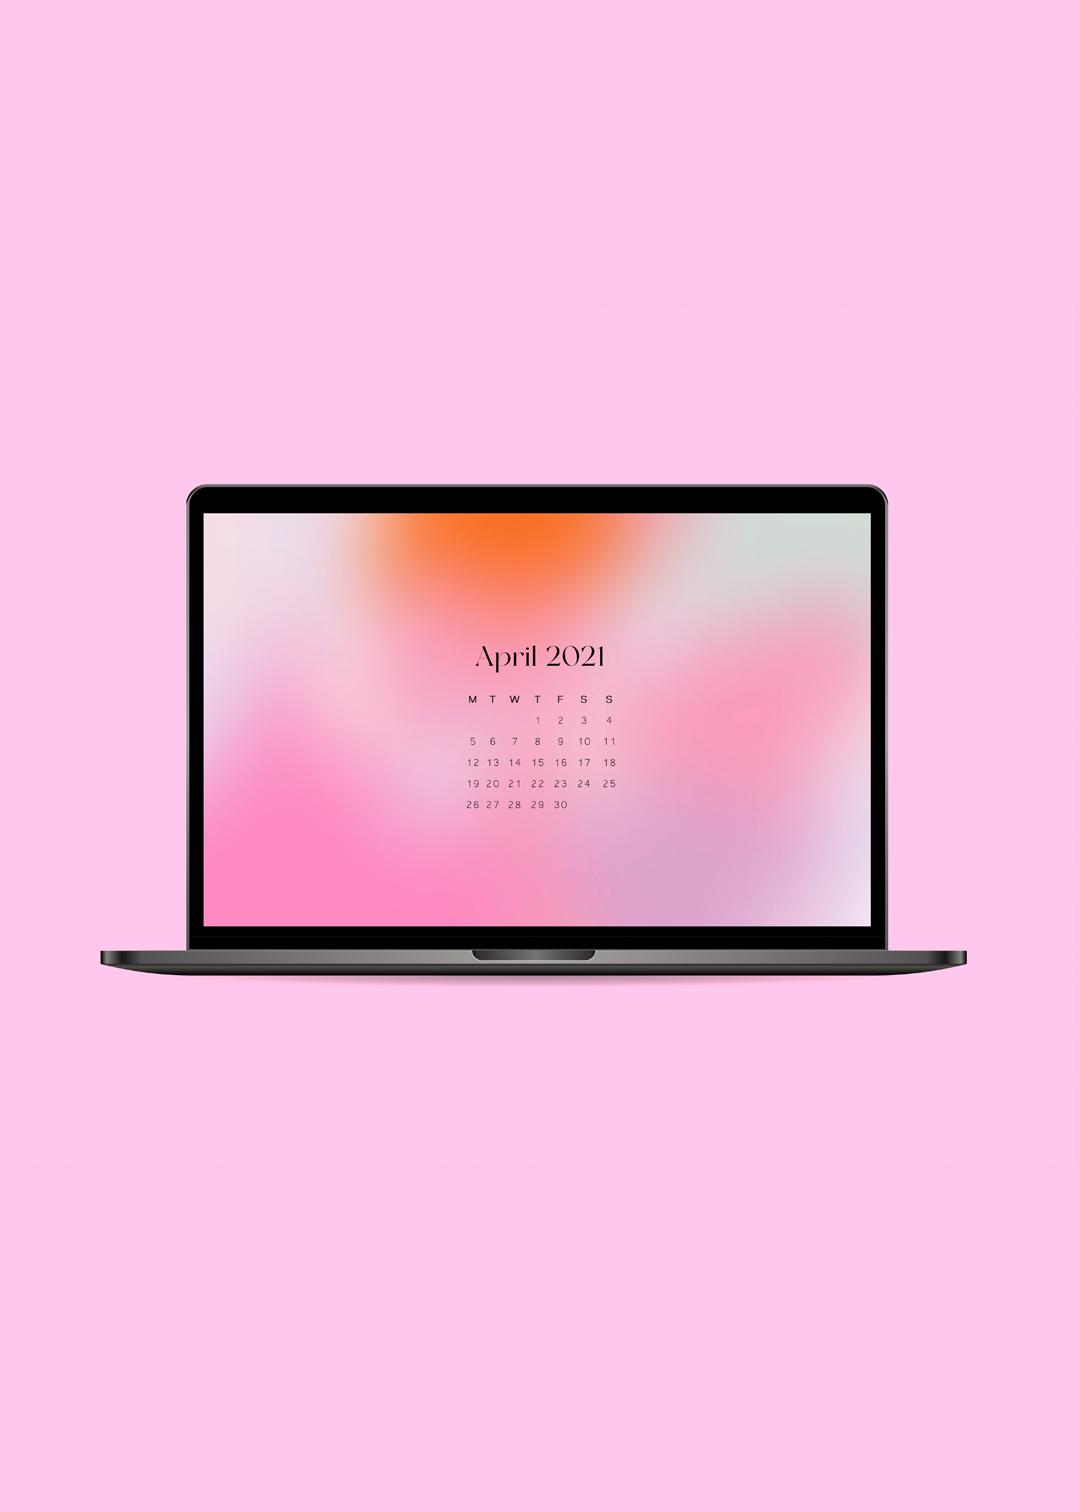 Oh Hey Cindy - April 2021 Free Desktop Wallpaper